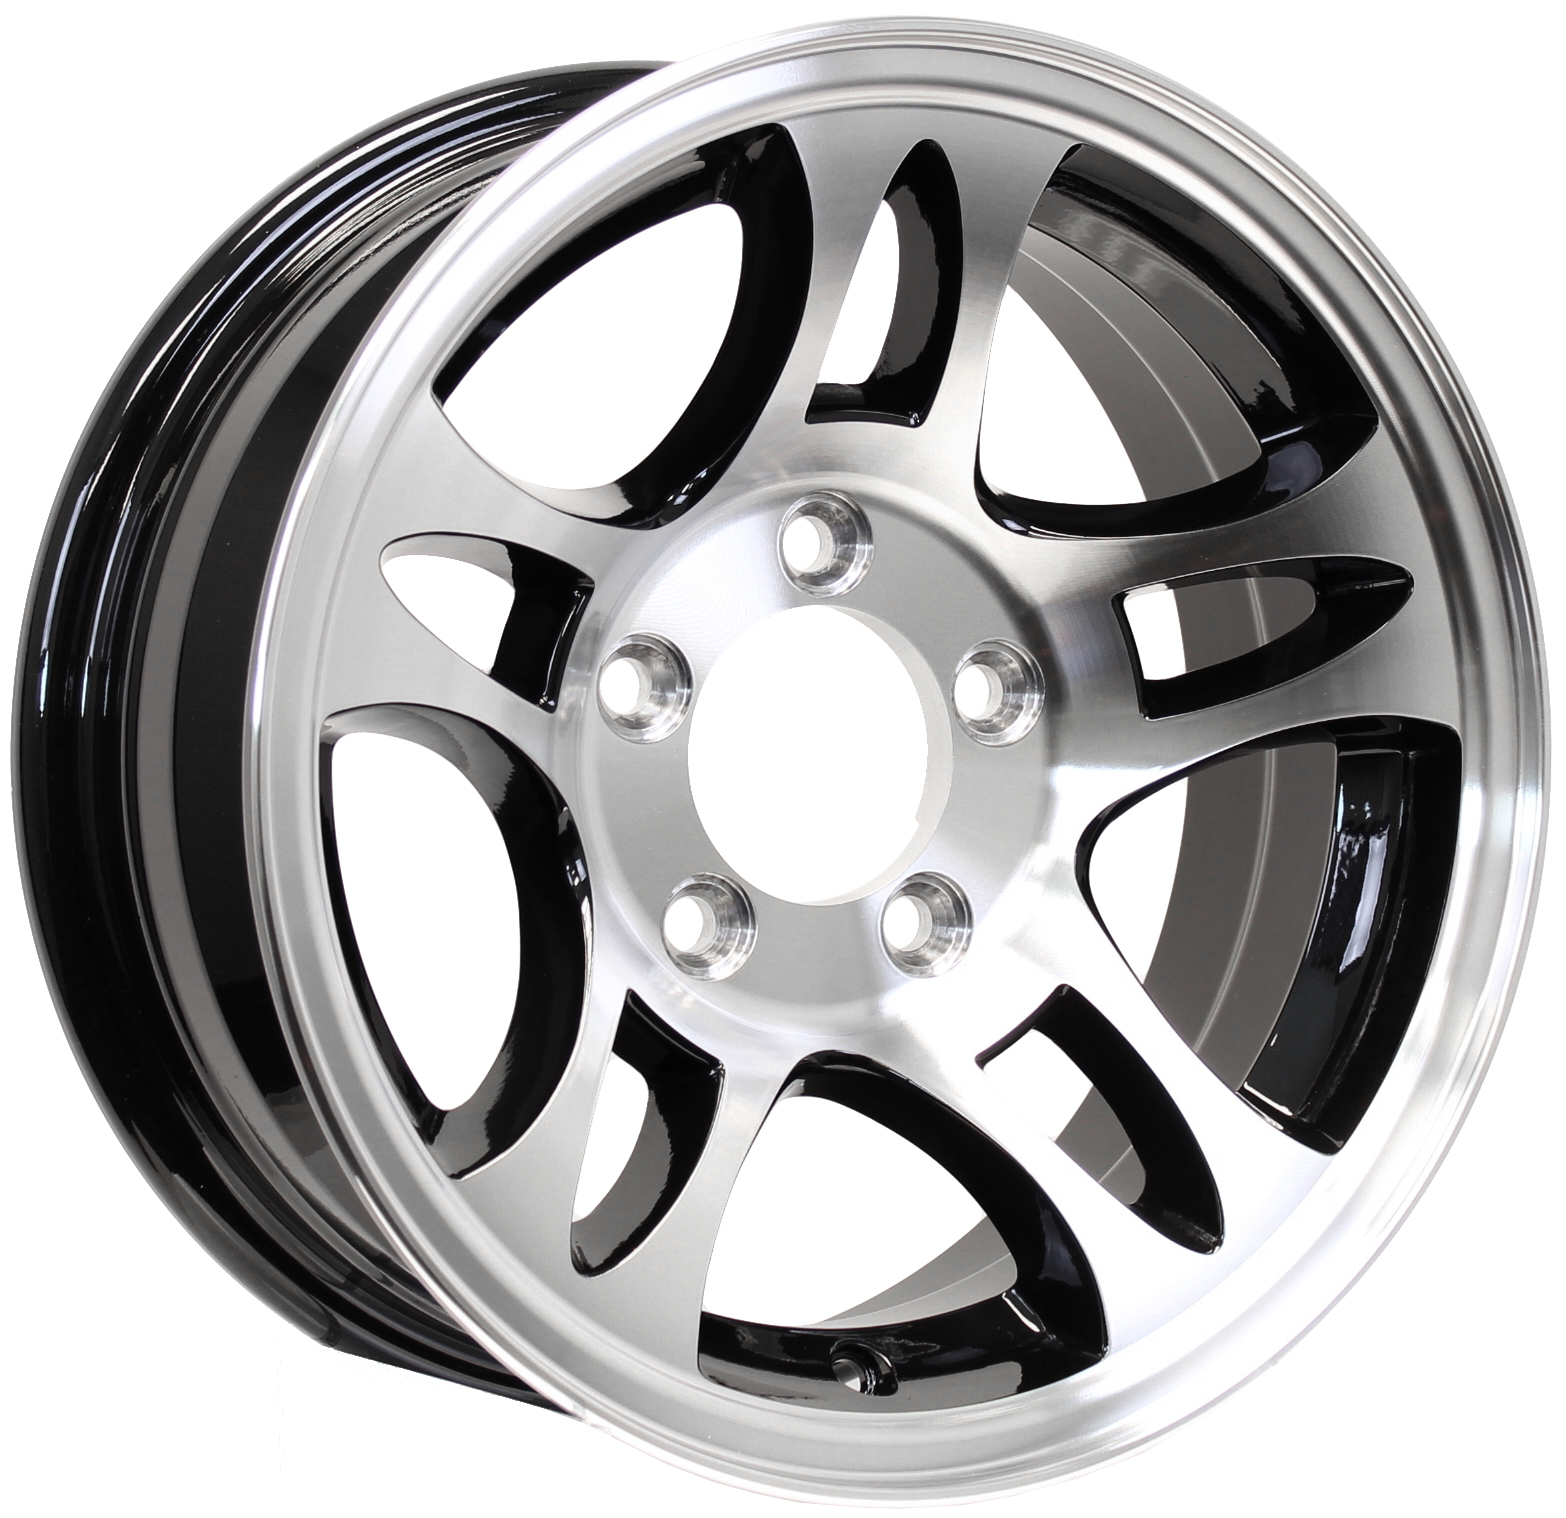 T03 15x5 5-Lug Black Machine Aluminum Trailer Wheel Image